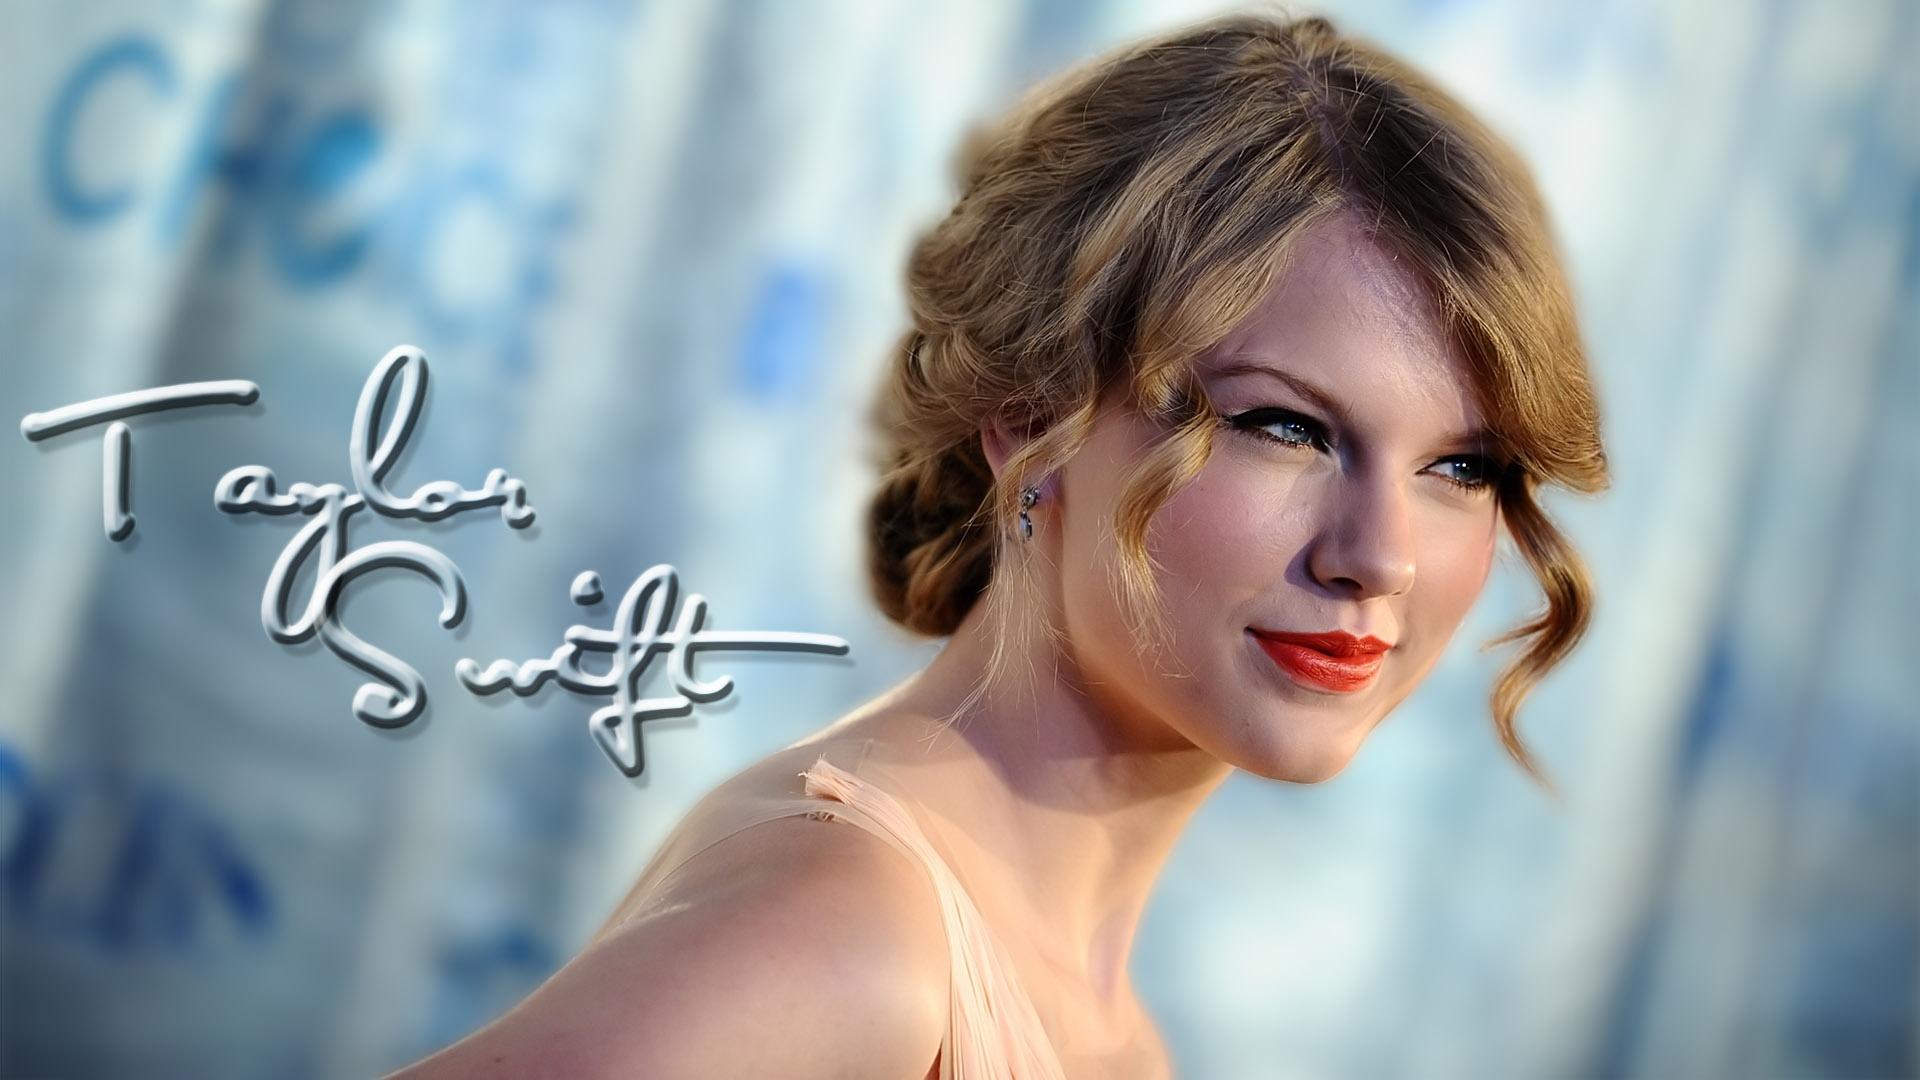 Lovely Taylor Wallpaper   Taylor Swift Wallpaper 26240296 1920x1080